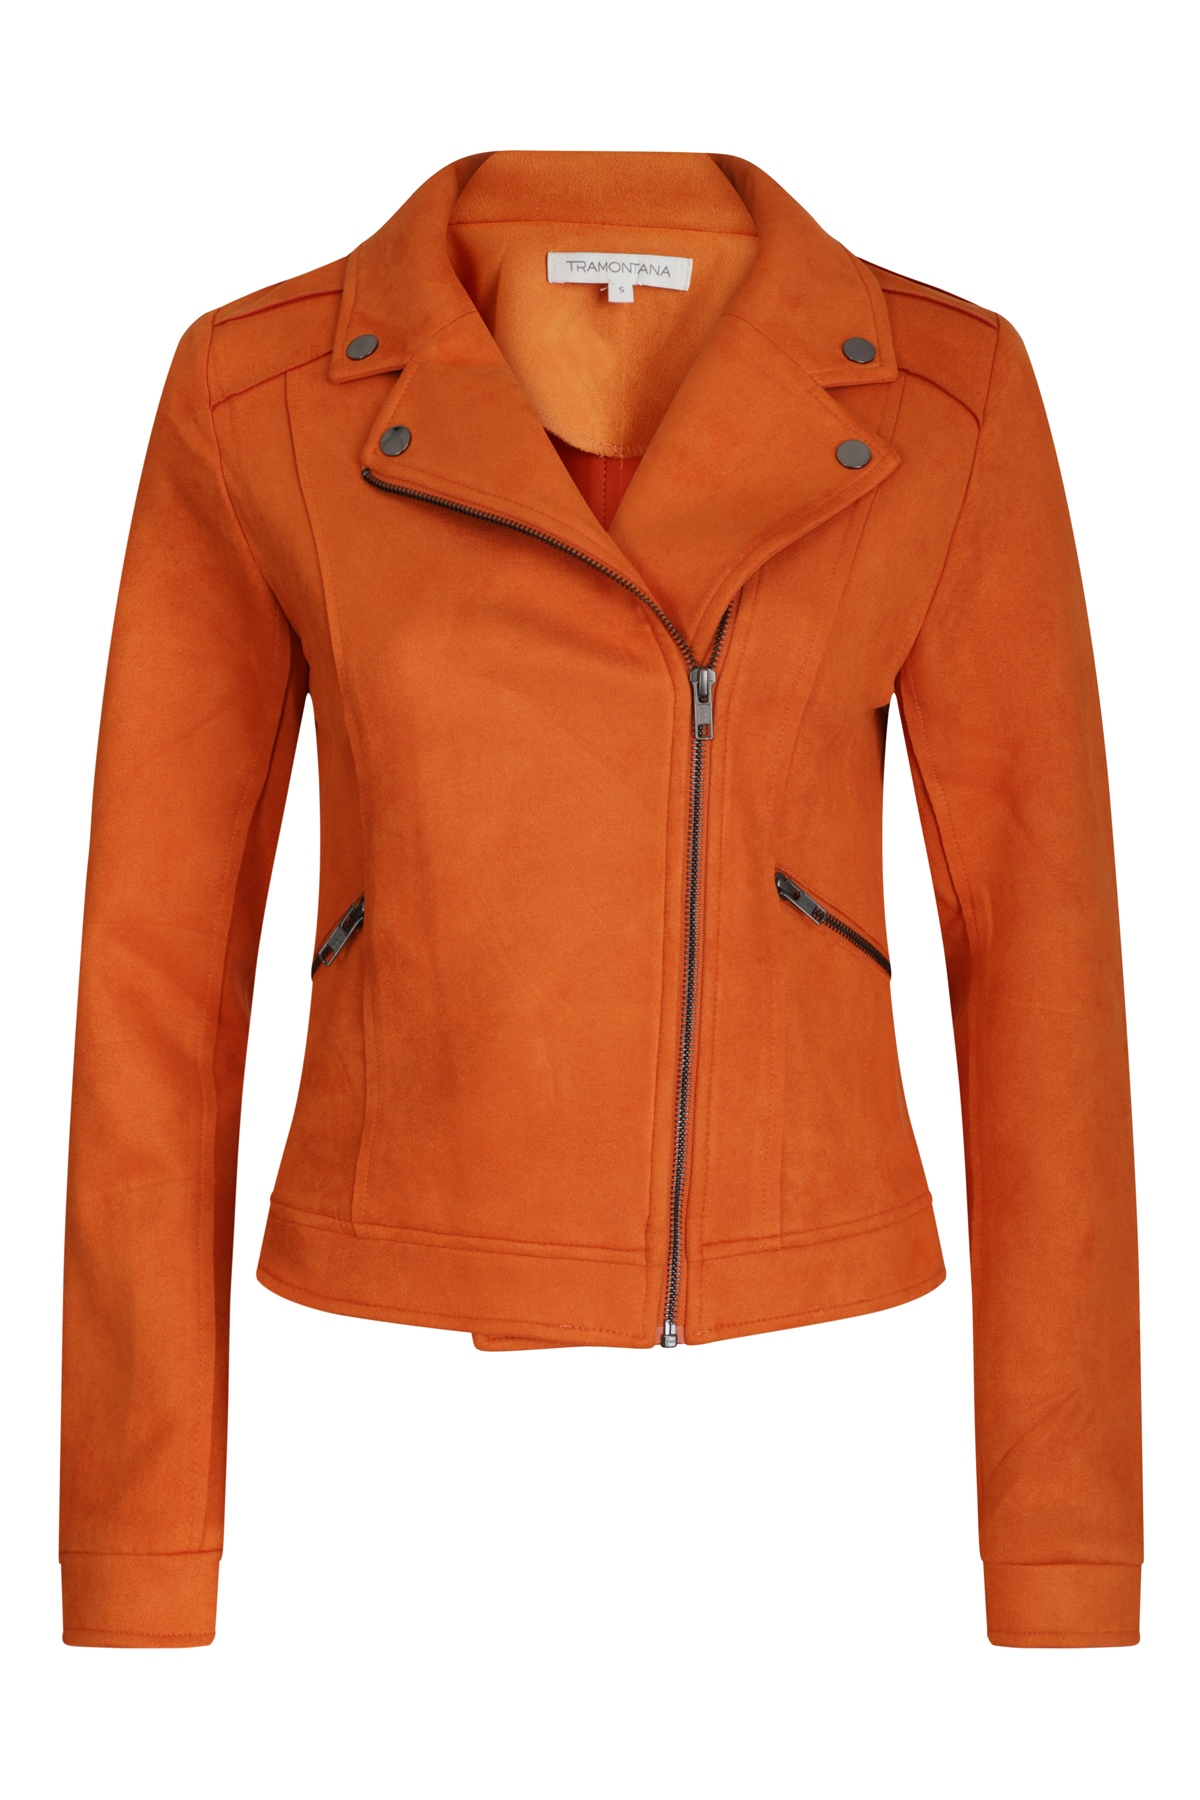 Tramontana Blazer - Jasje Oranje C05-94-802